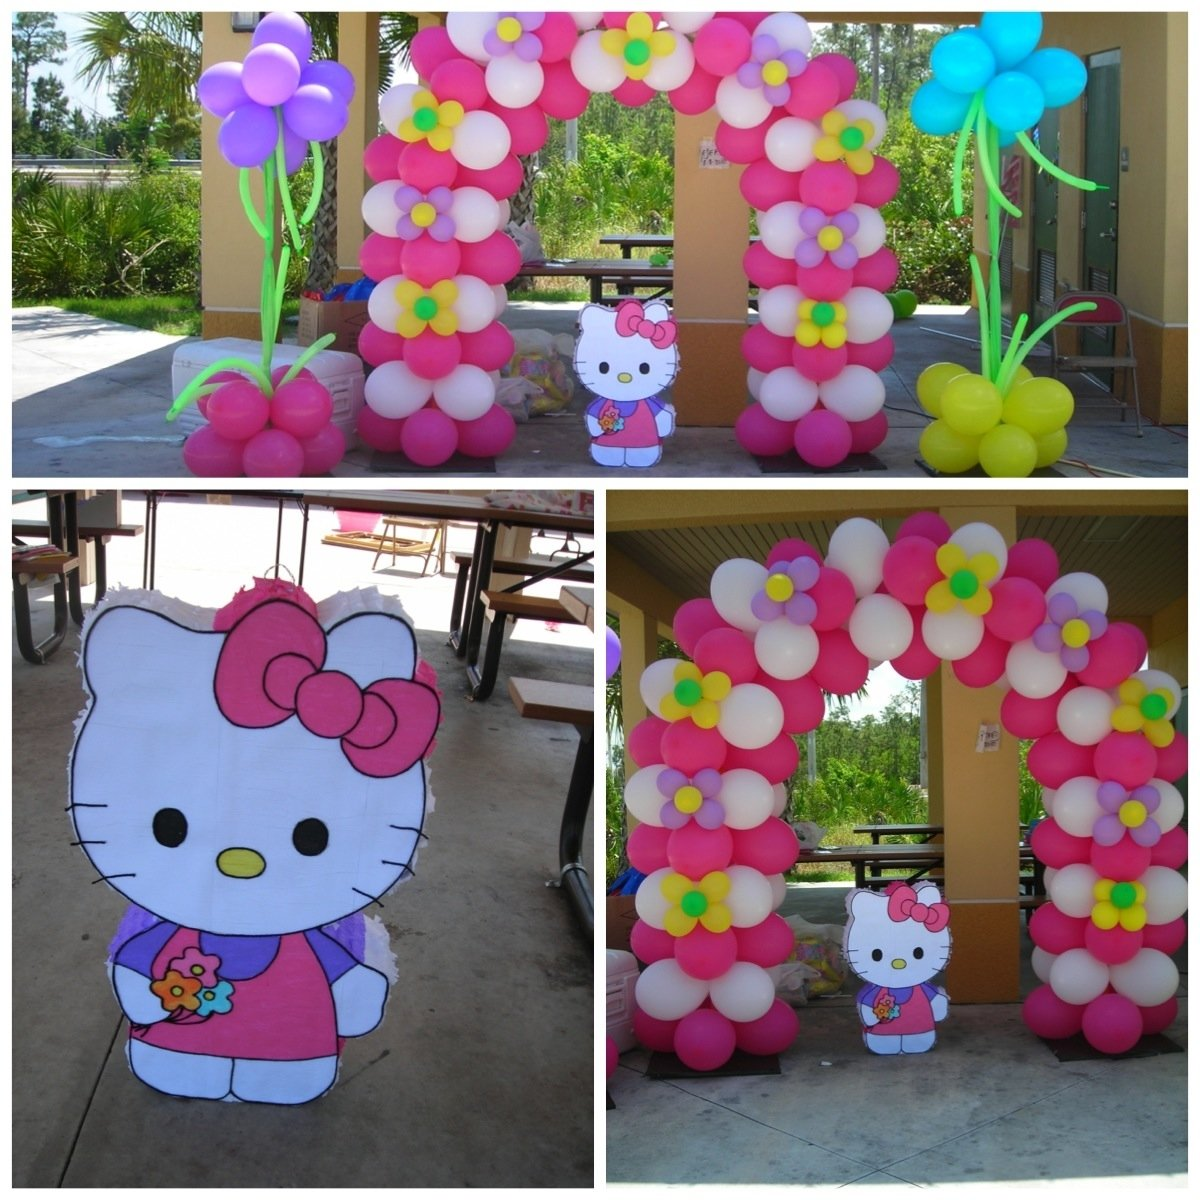 10 Unique Hello Kitty Party Decoration Ideas hello kitty balloon decorations balloon decorations by teasha 2021